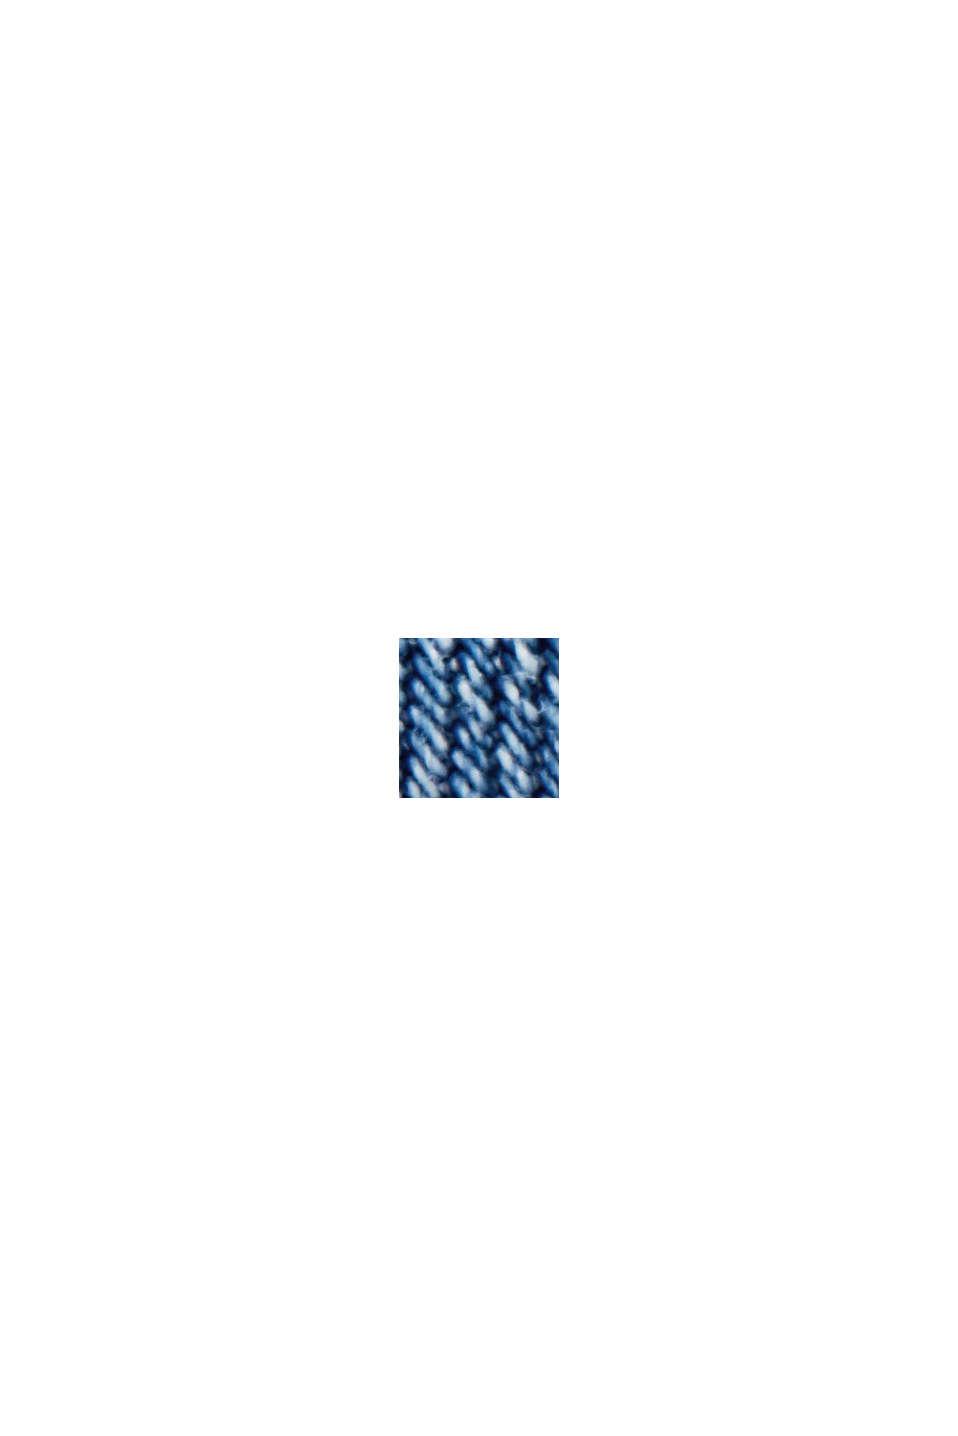 Stretchjeans met biologisch katoen, BLUE LIGHT WASHED, swatch